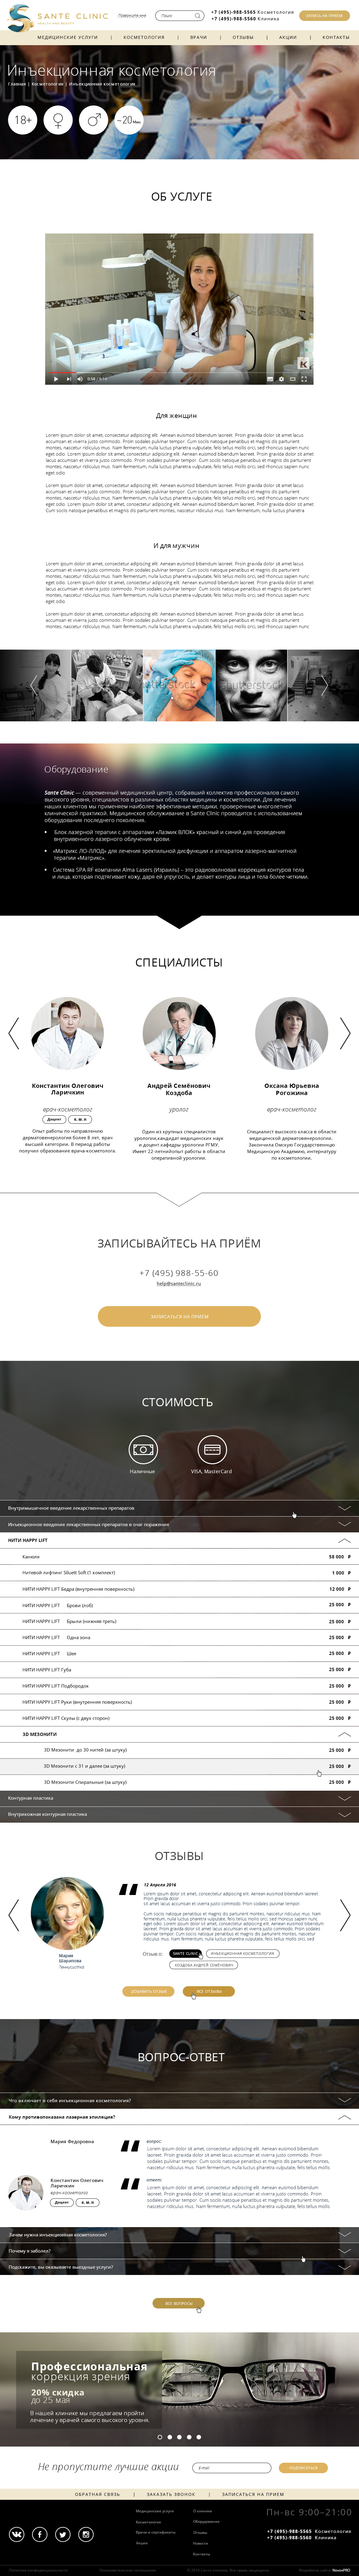 service_detail